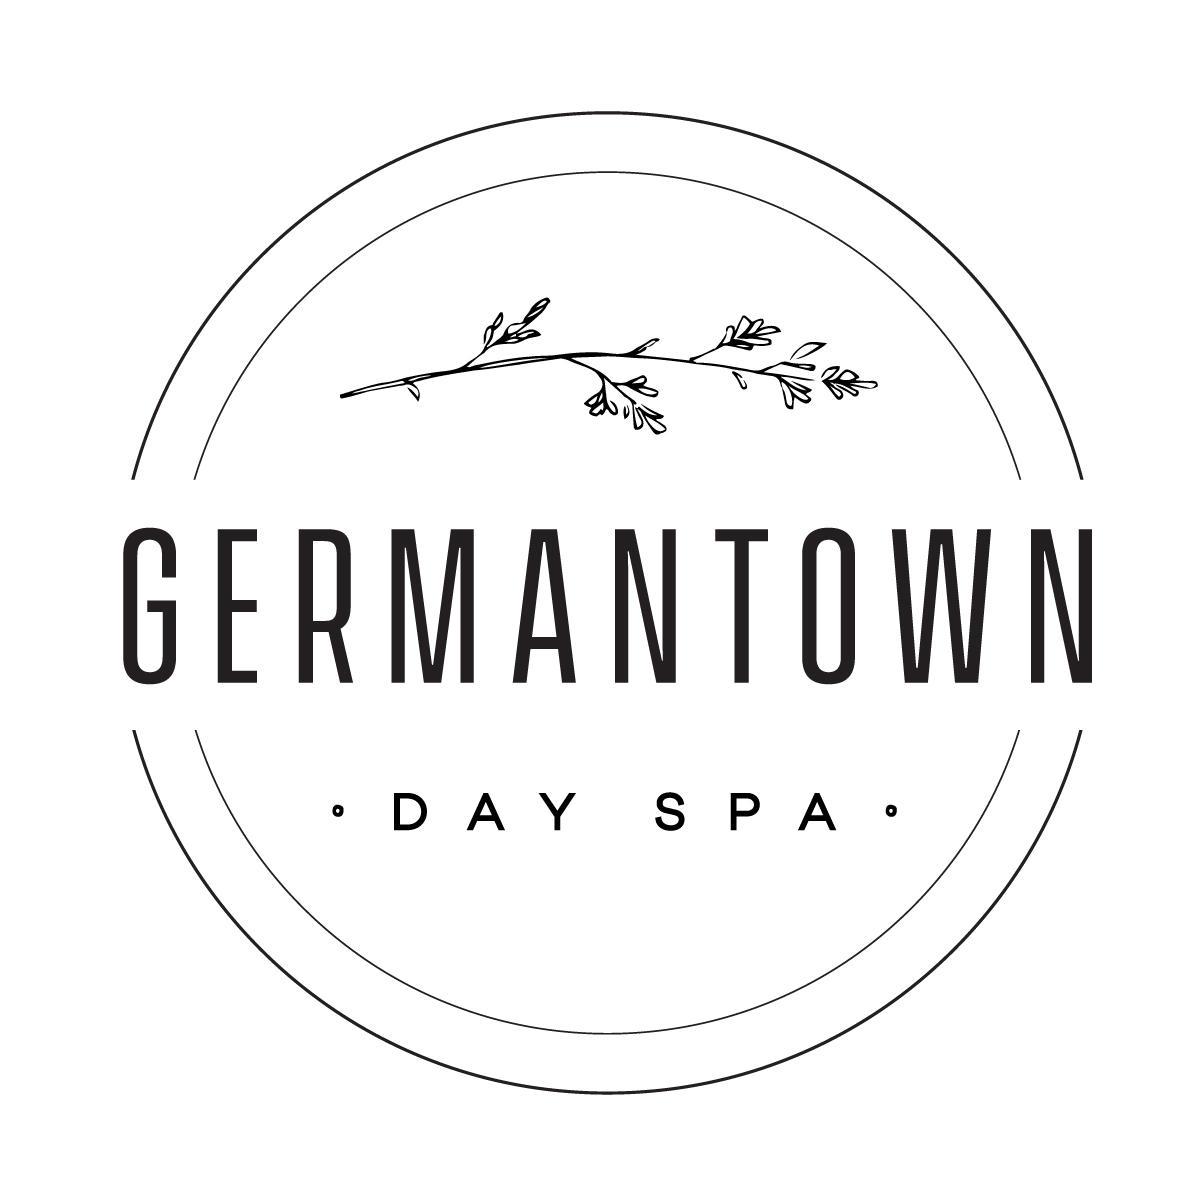 Germantown Day Spa - Germantown, TN 38138 - (901)737-2840 | ShowMeLocal.com